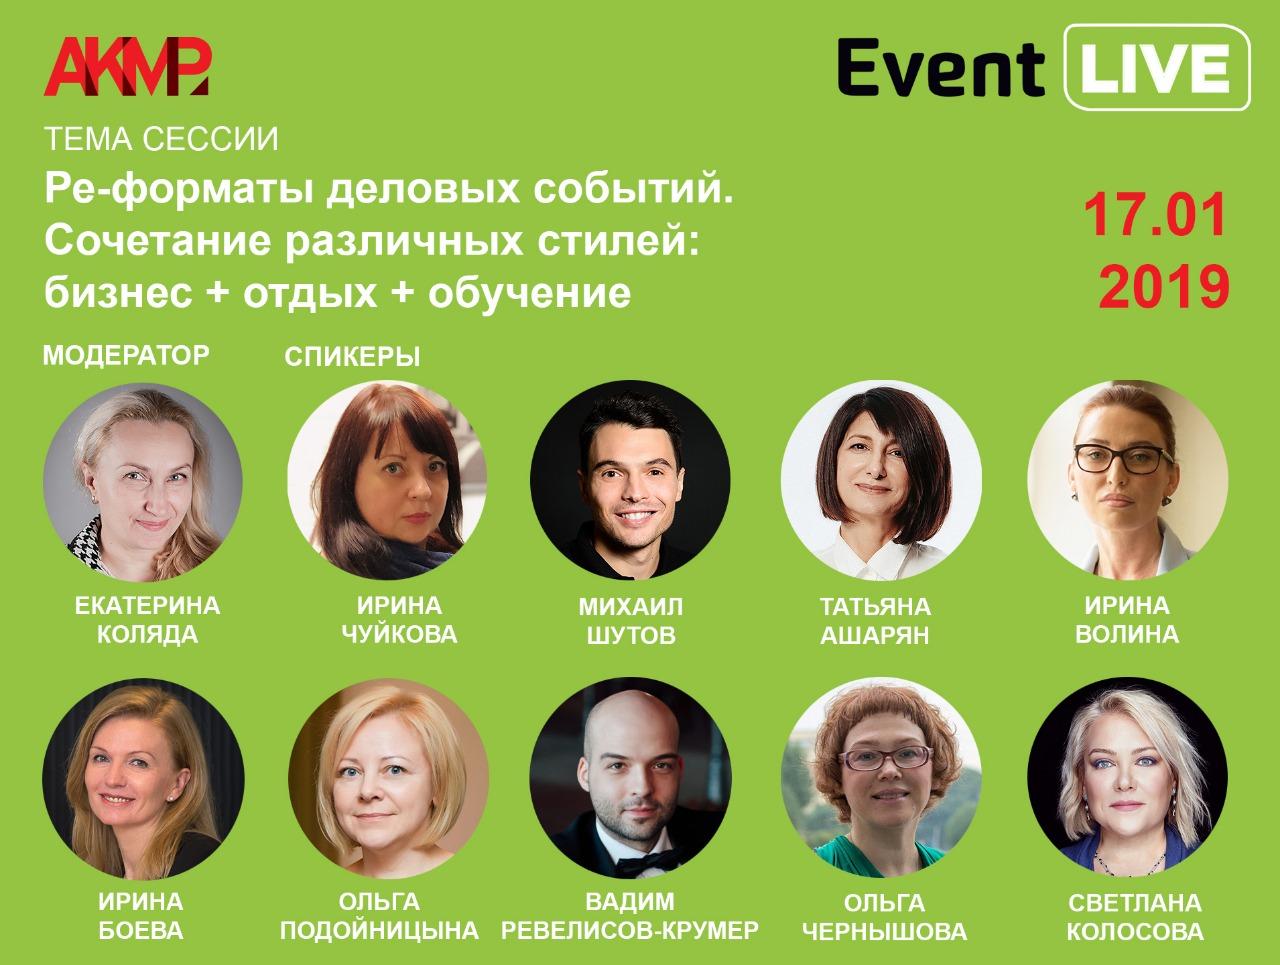 Event live 2019 АКМР